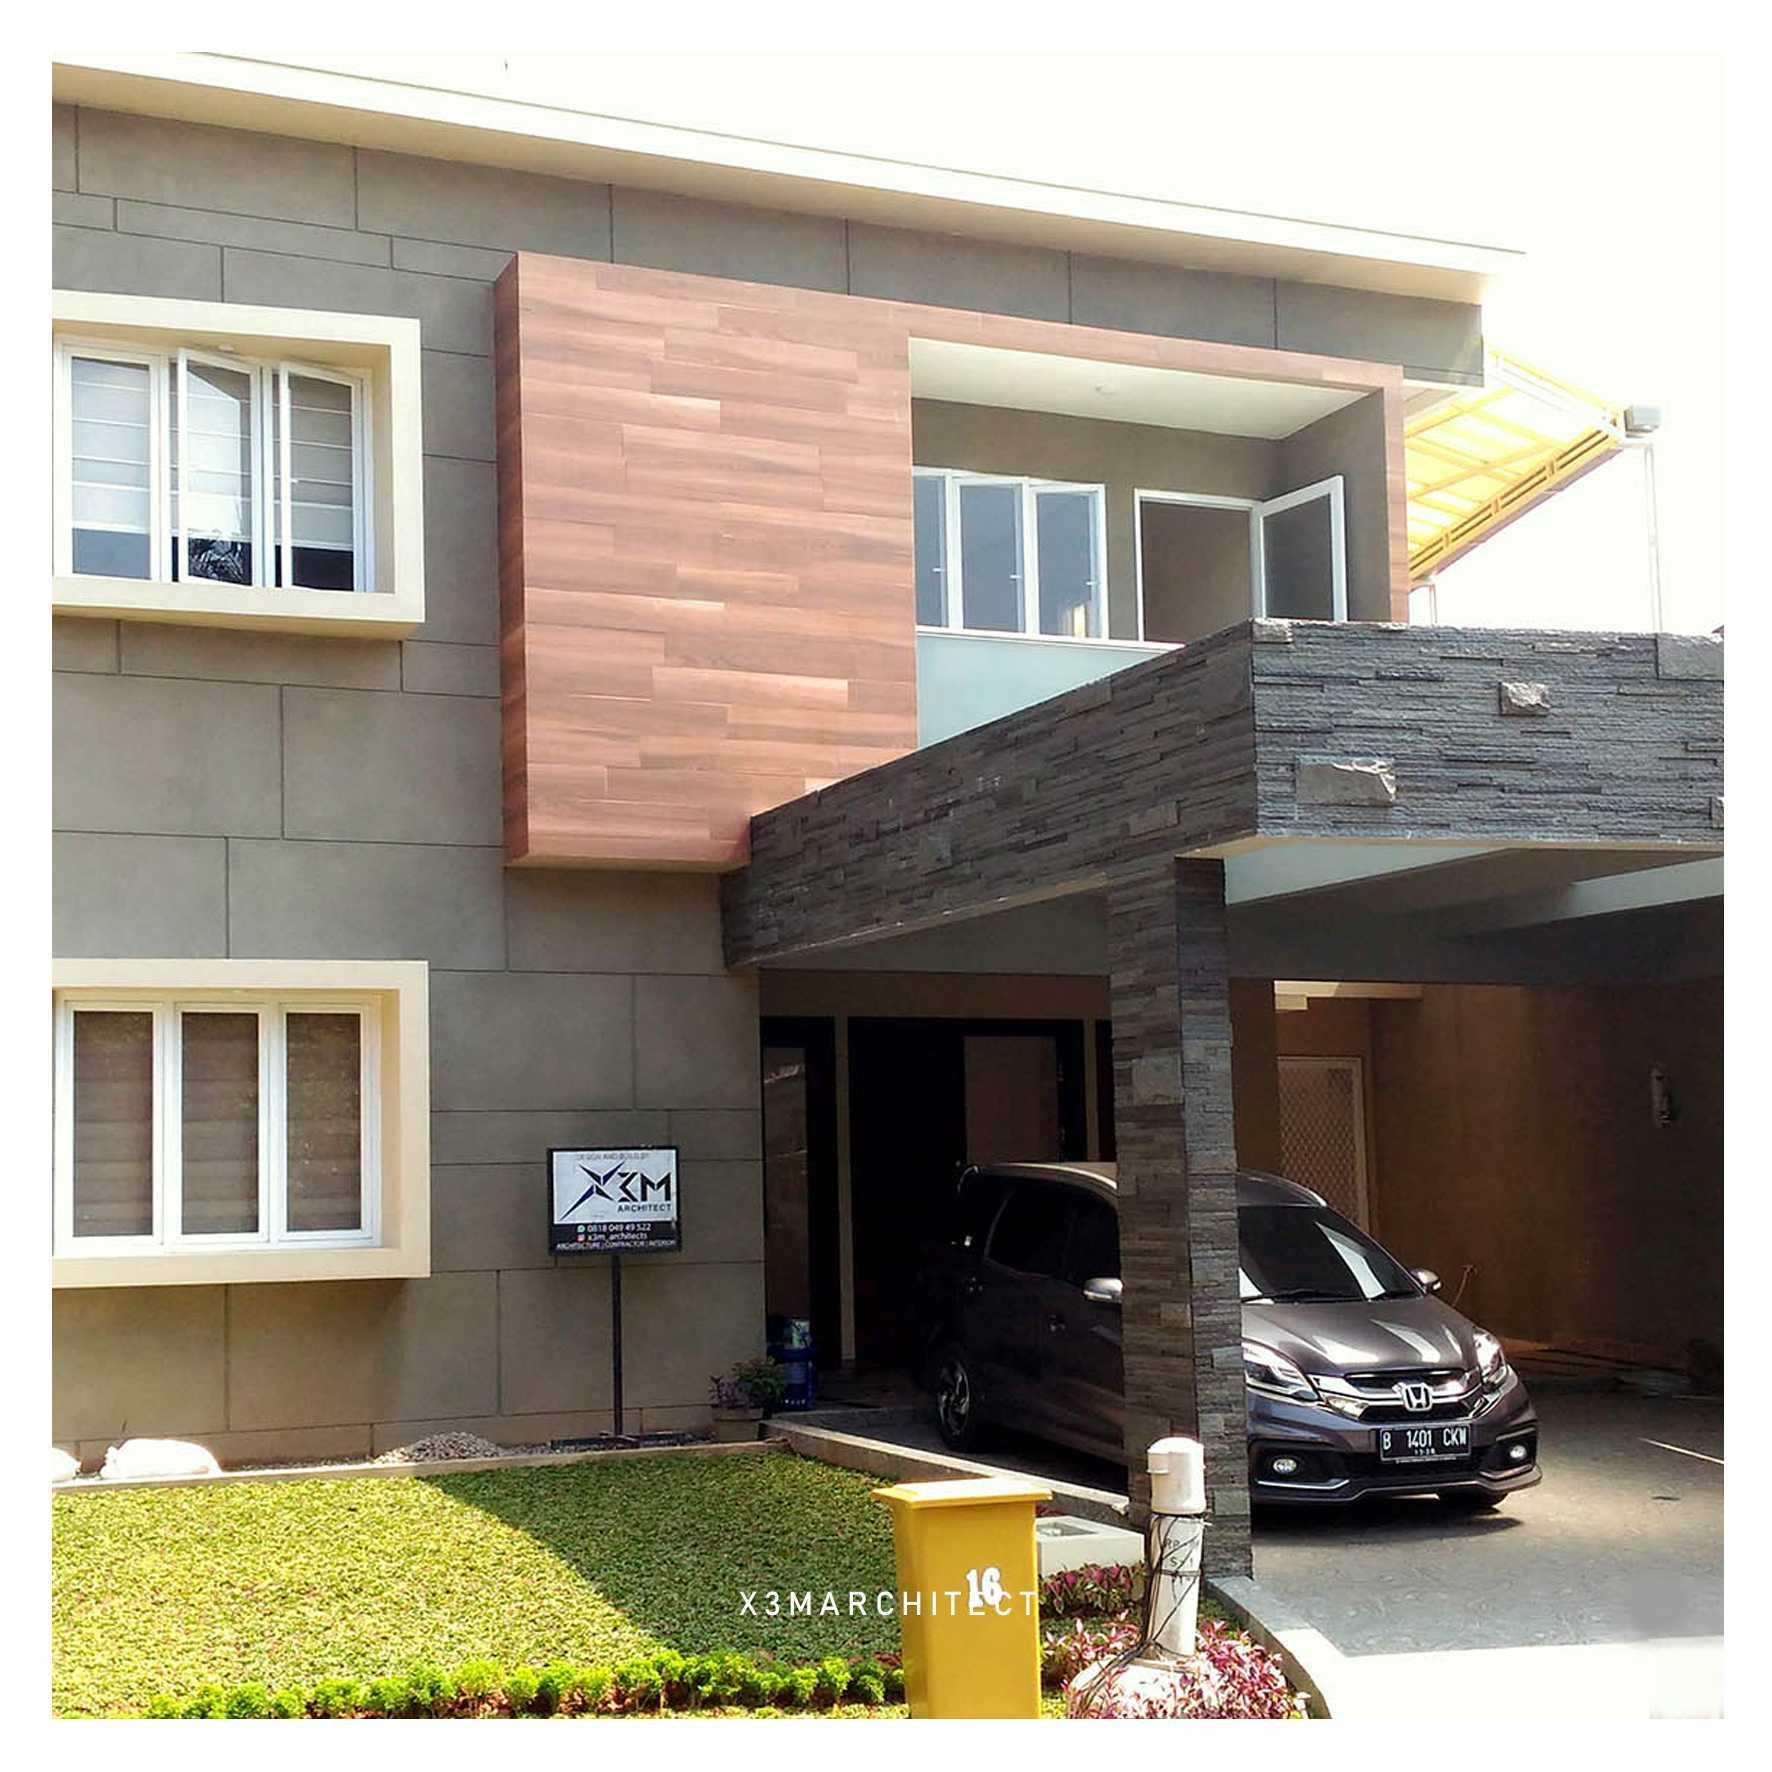 X3M Architects Beringin Golf Residence Jl. Cendana Golf No.2, Bencongan, Klp. Dua, Tangerang, Banten 15810, Indonesia Jl. Cendana Golf No.2, Bencongan, Klp. Dua, Tangerang, Banten 15810, Indonesia X3M-Architects-Beringin-Golf-Residence  75944